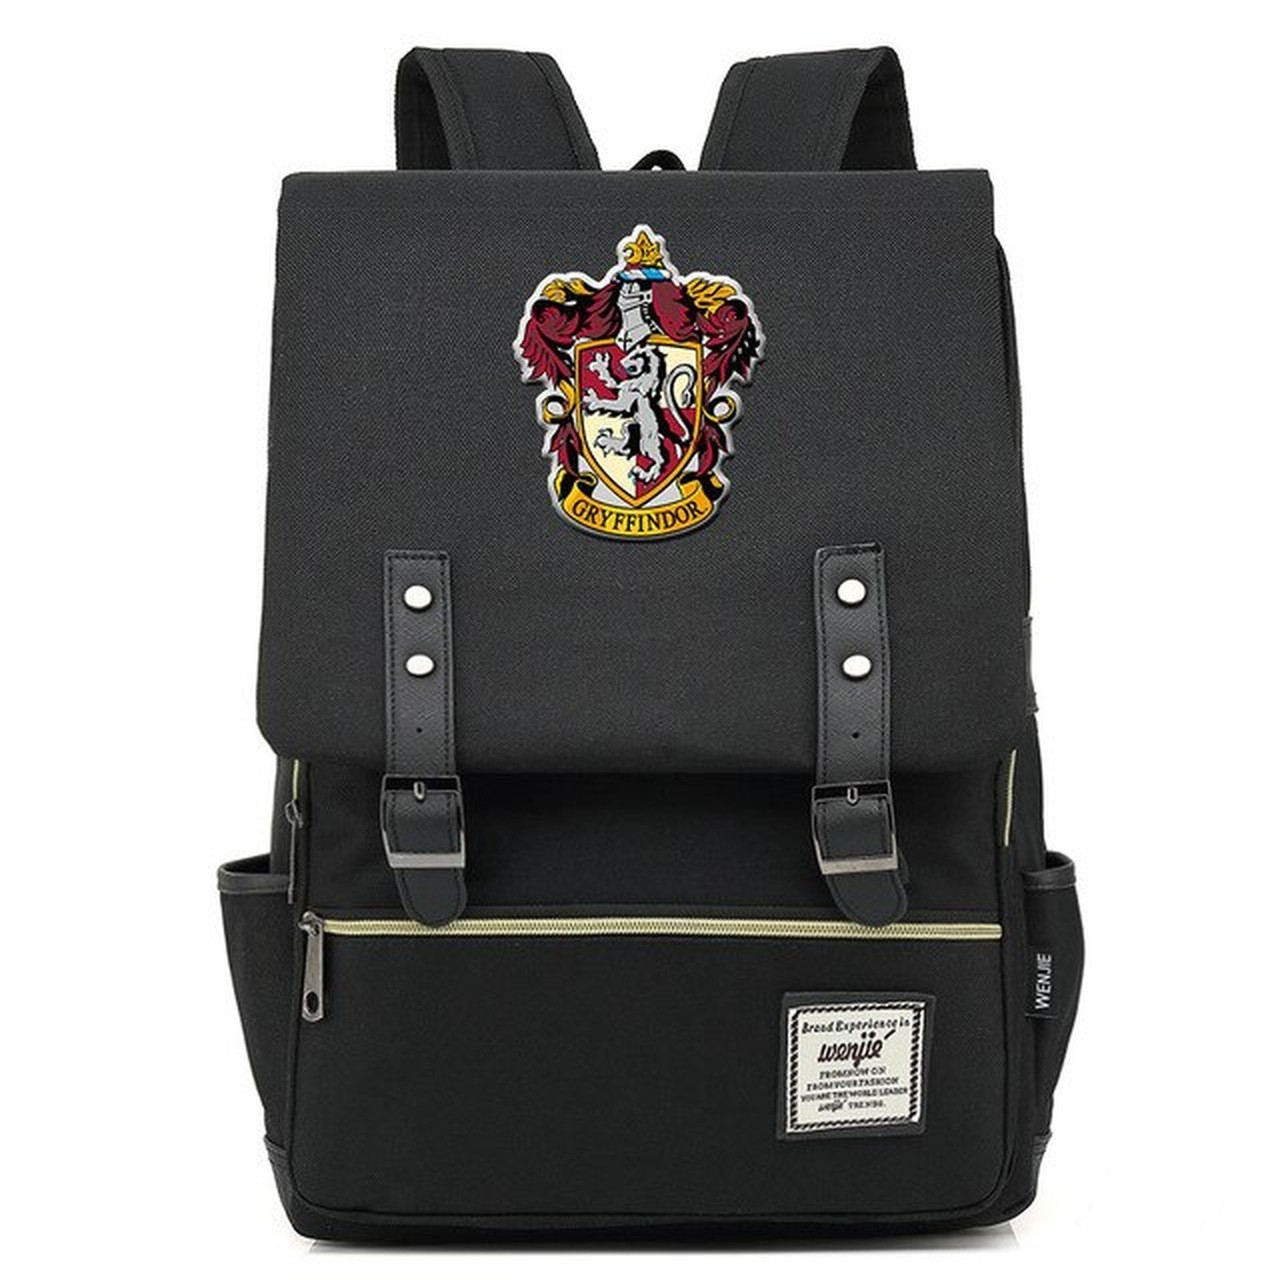 Mochila Hogwarts Casa Grifinória: Harry Potter (Preto)